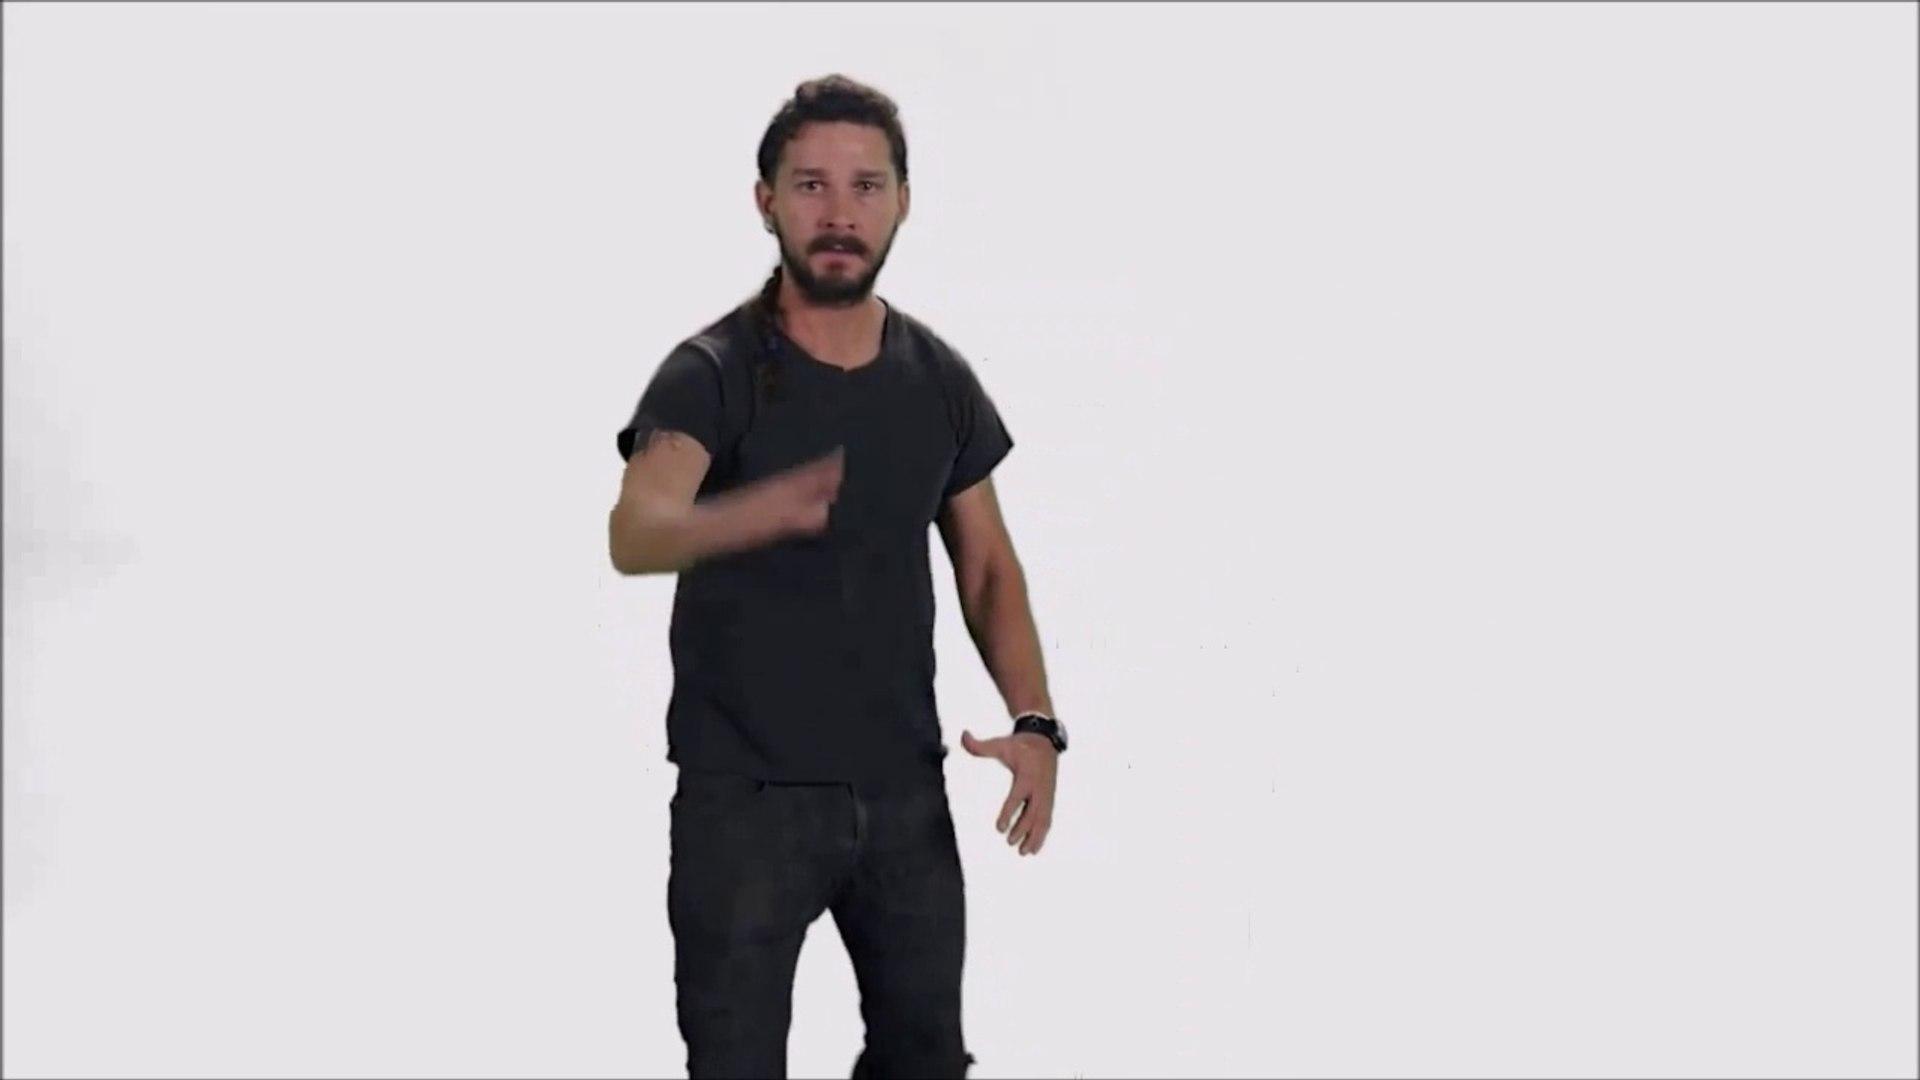 Shia LaBeouf motivational speech best parodies - Compilation